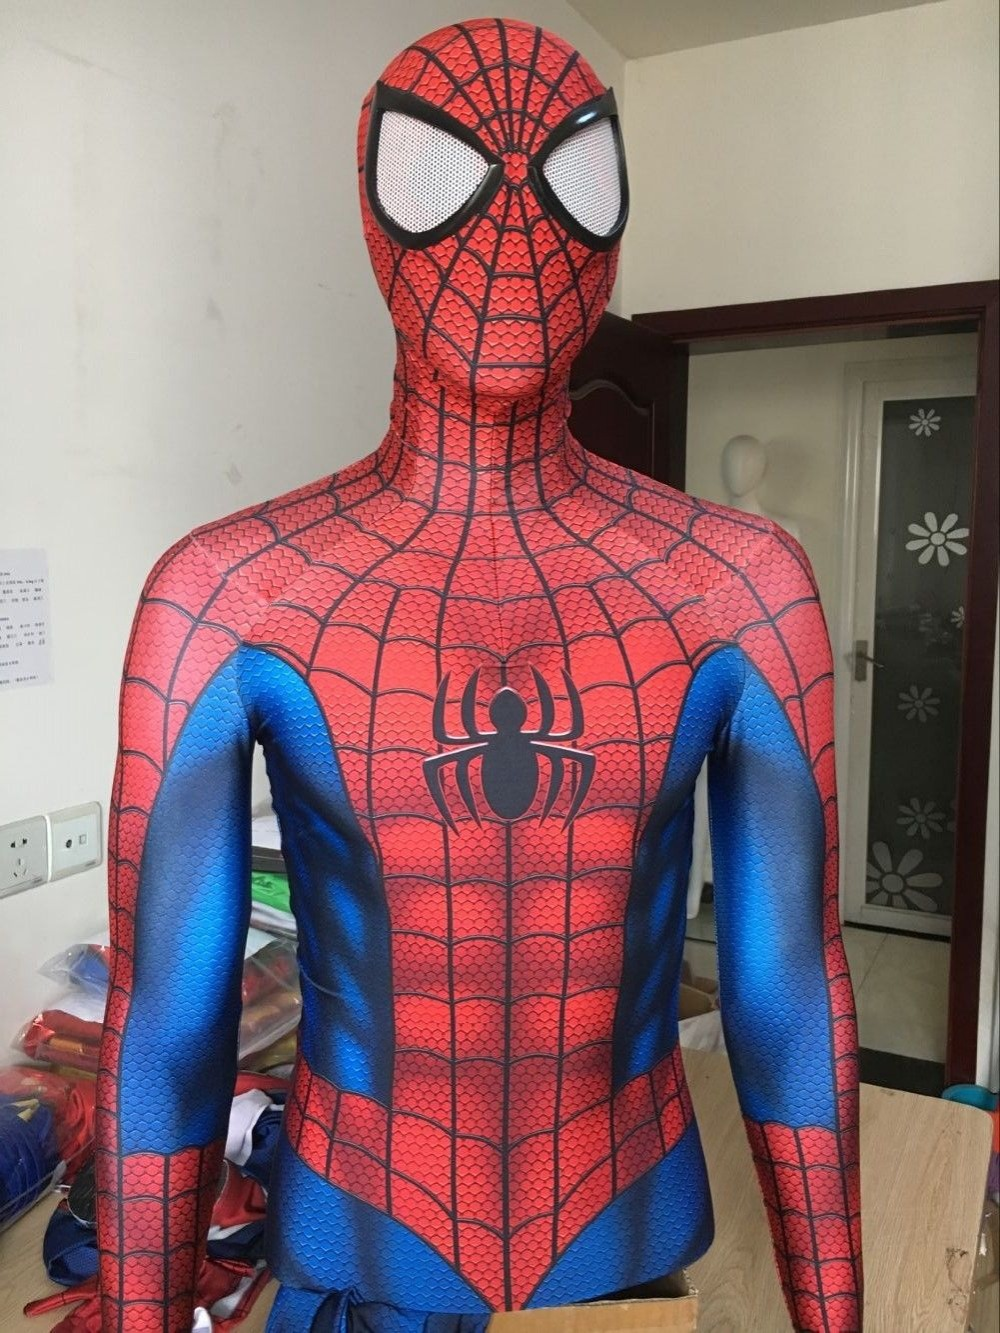 2017 New Spider Man Superhero Costume 3D Print Fullbody Halloween Cosplay Suit Spiderman Costume For Adult/Kids/Custom Made